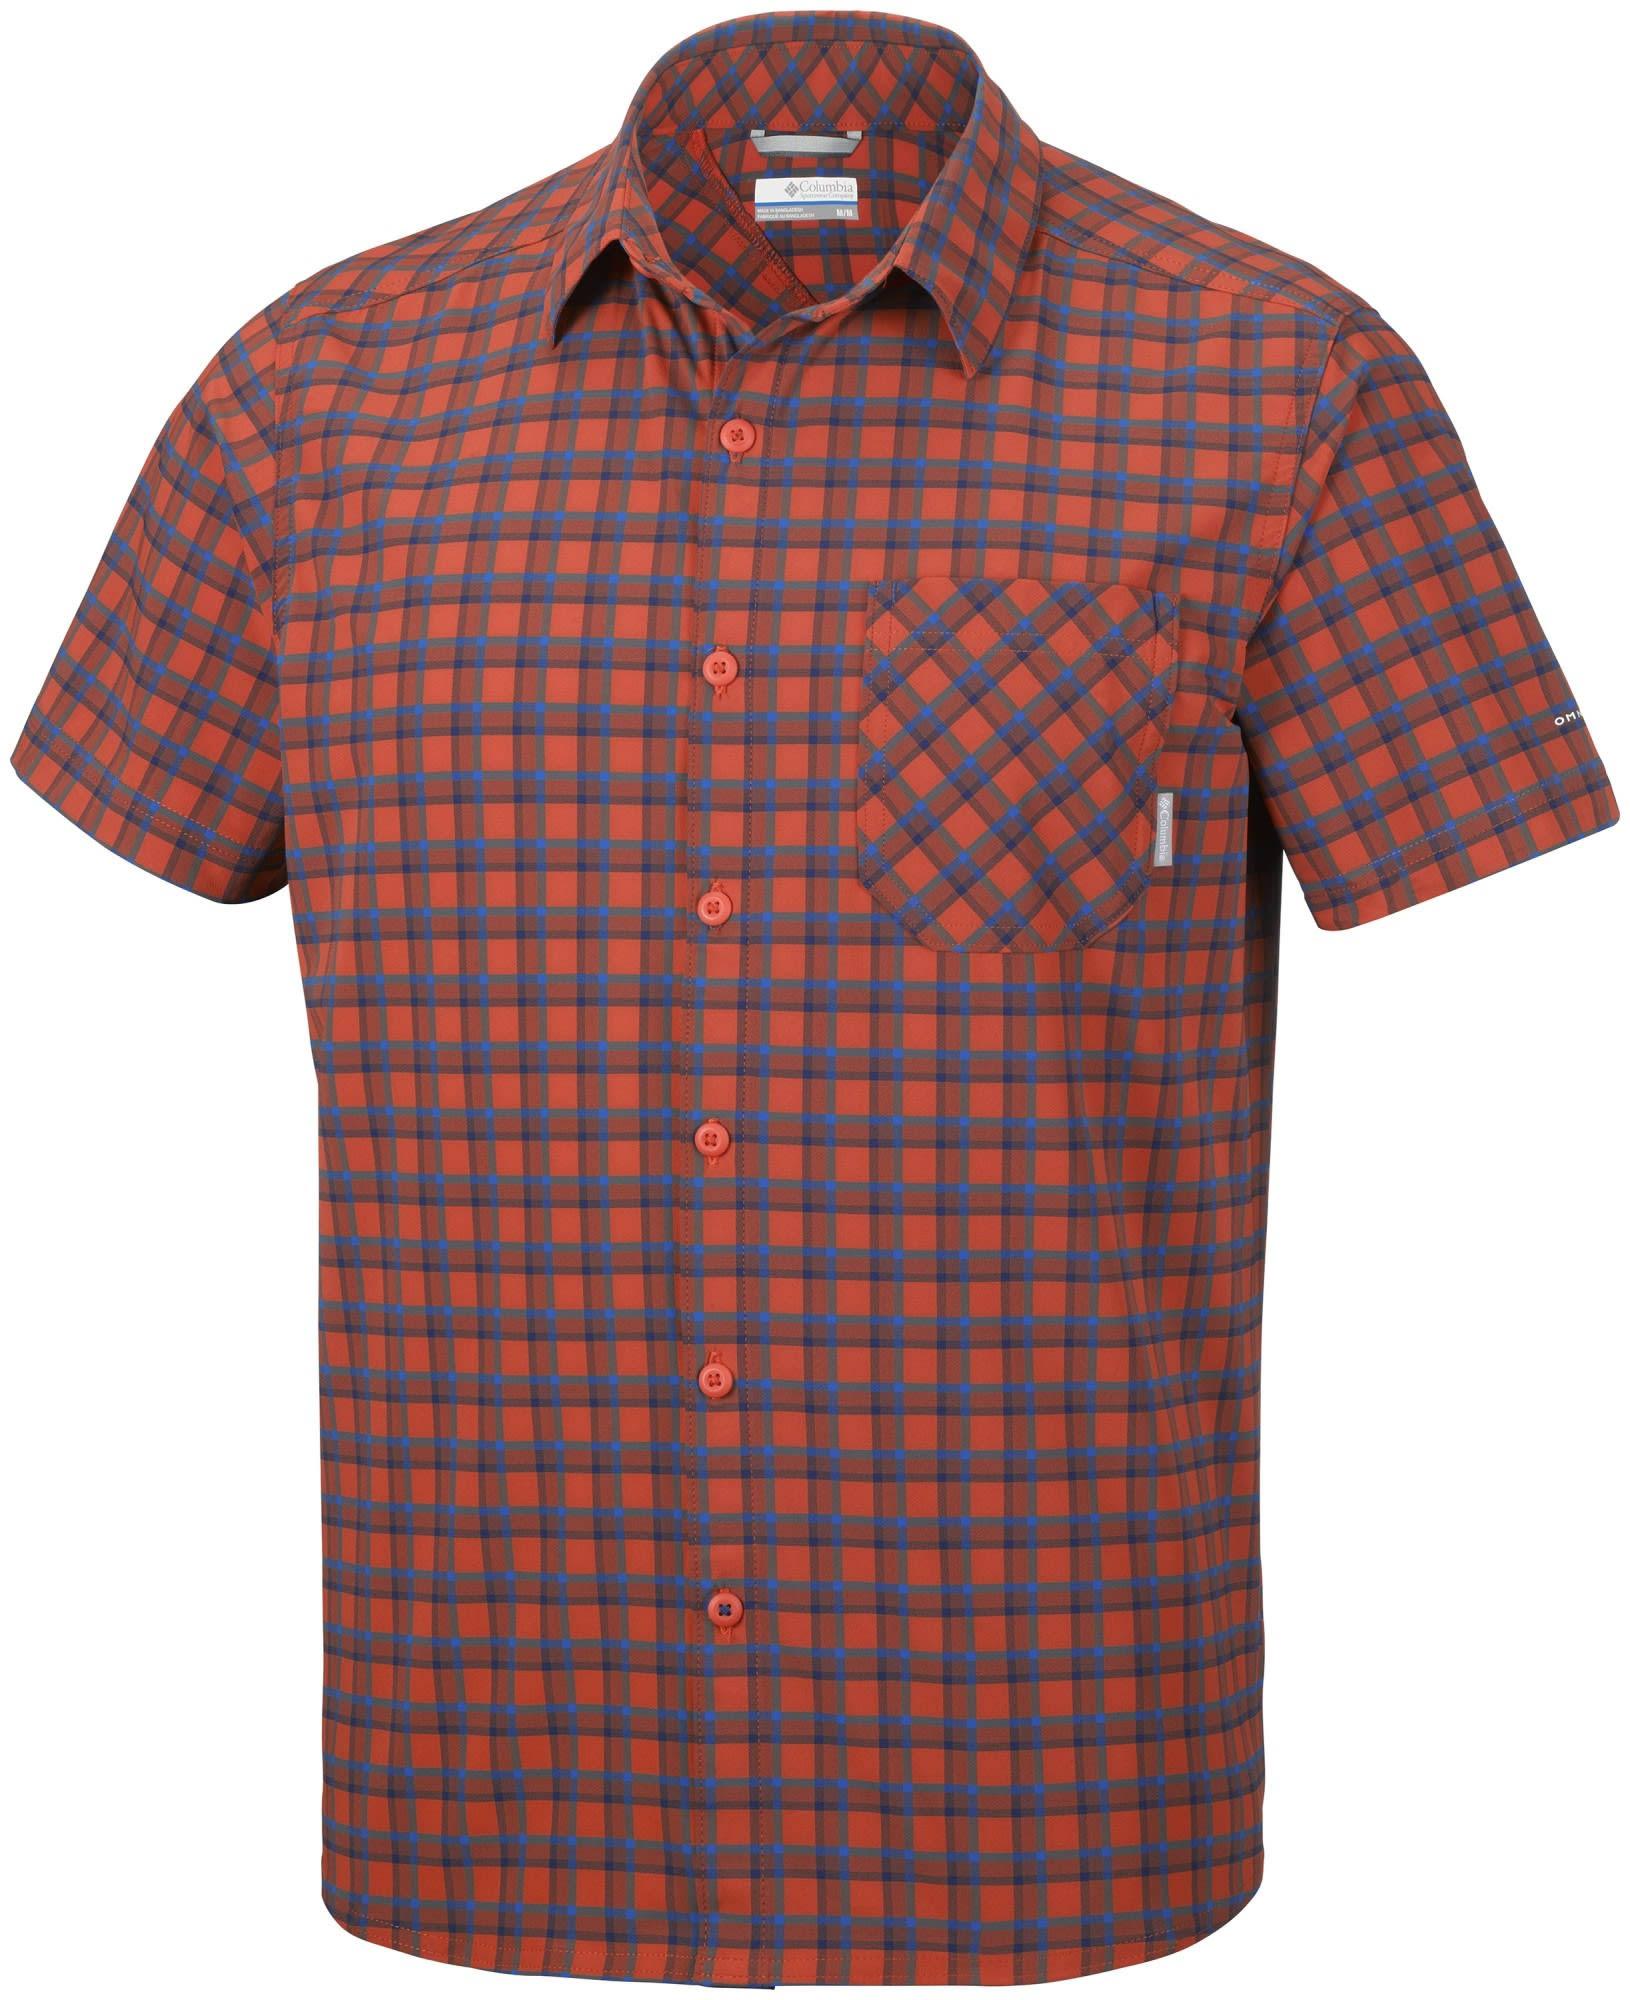 Triple Manga Plaid Camisa Para Heatwave Canyon Corta De Hombre Color Xl Columbia Roja Talla nHTq6T